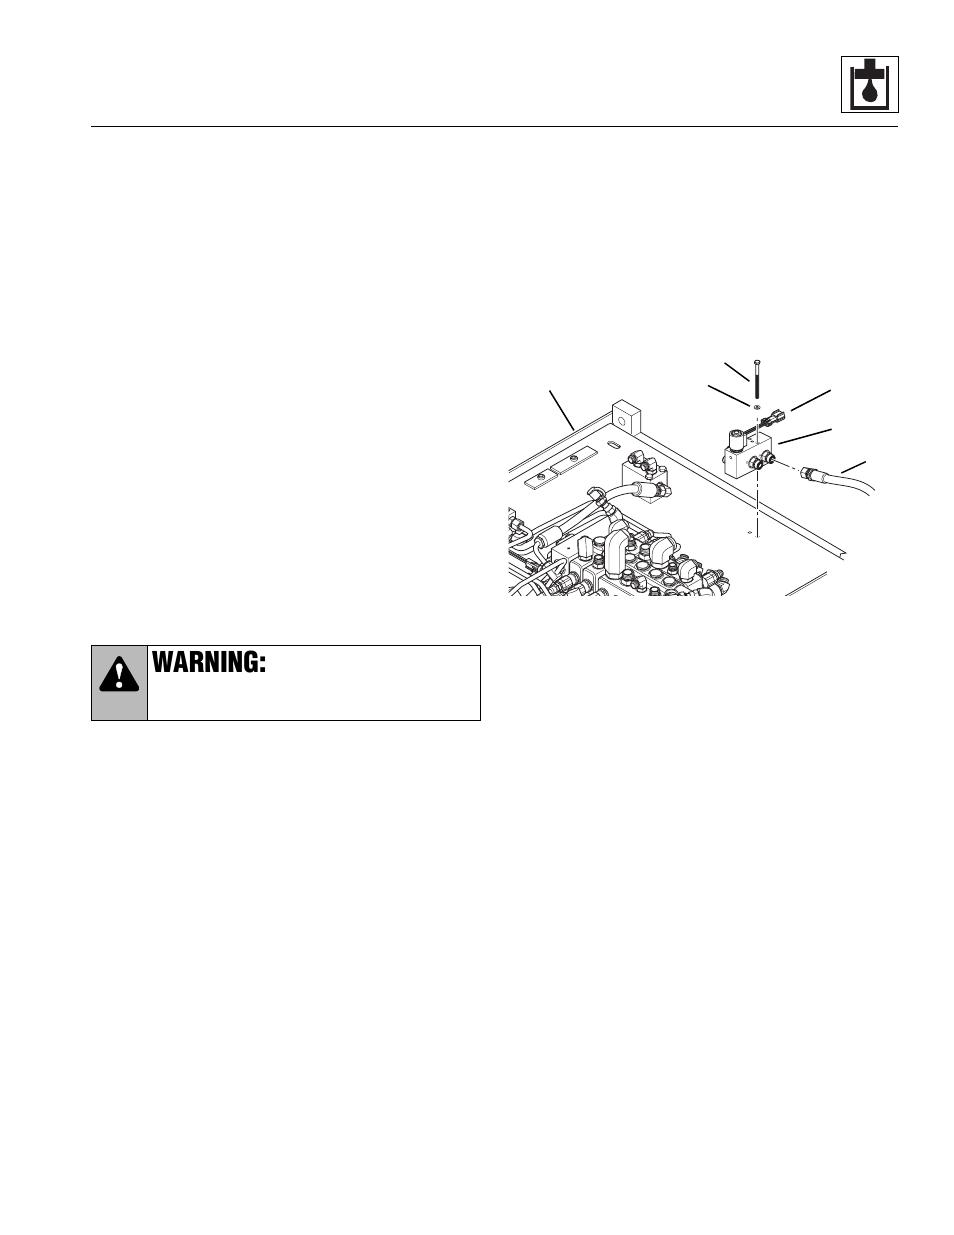 warning lull 944e 42 service manual user manual page 447 846 rh manualsdir com Lull 644 Load Chart Lull 644 Weight